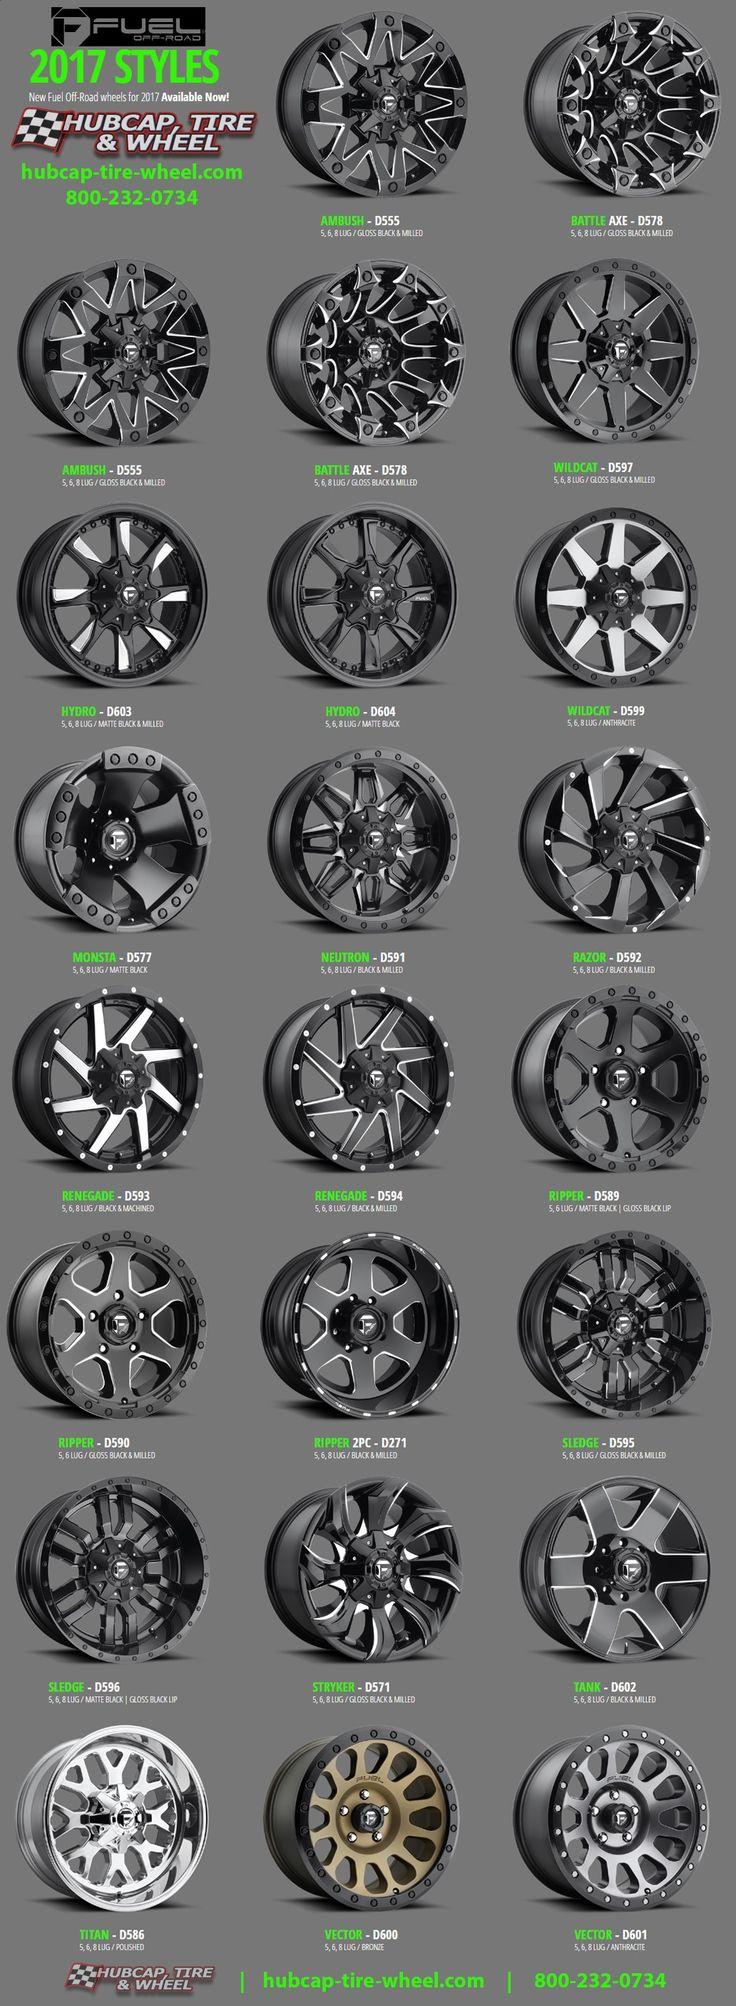 2017 Fuel Off-Road Wheels & Rims - For Jeeps, Trucks, SUV's #RePin by AT Social Media Marketing - Pinterest Marketing Specialists ATSocialMedia.co.uk #PerformanceTiresforCars